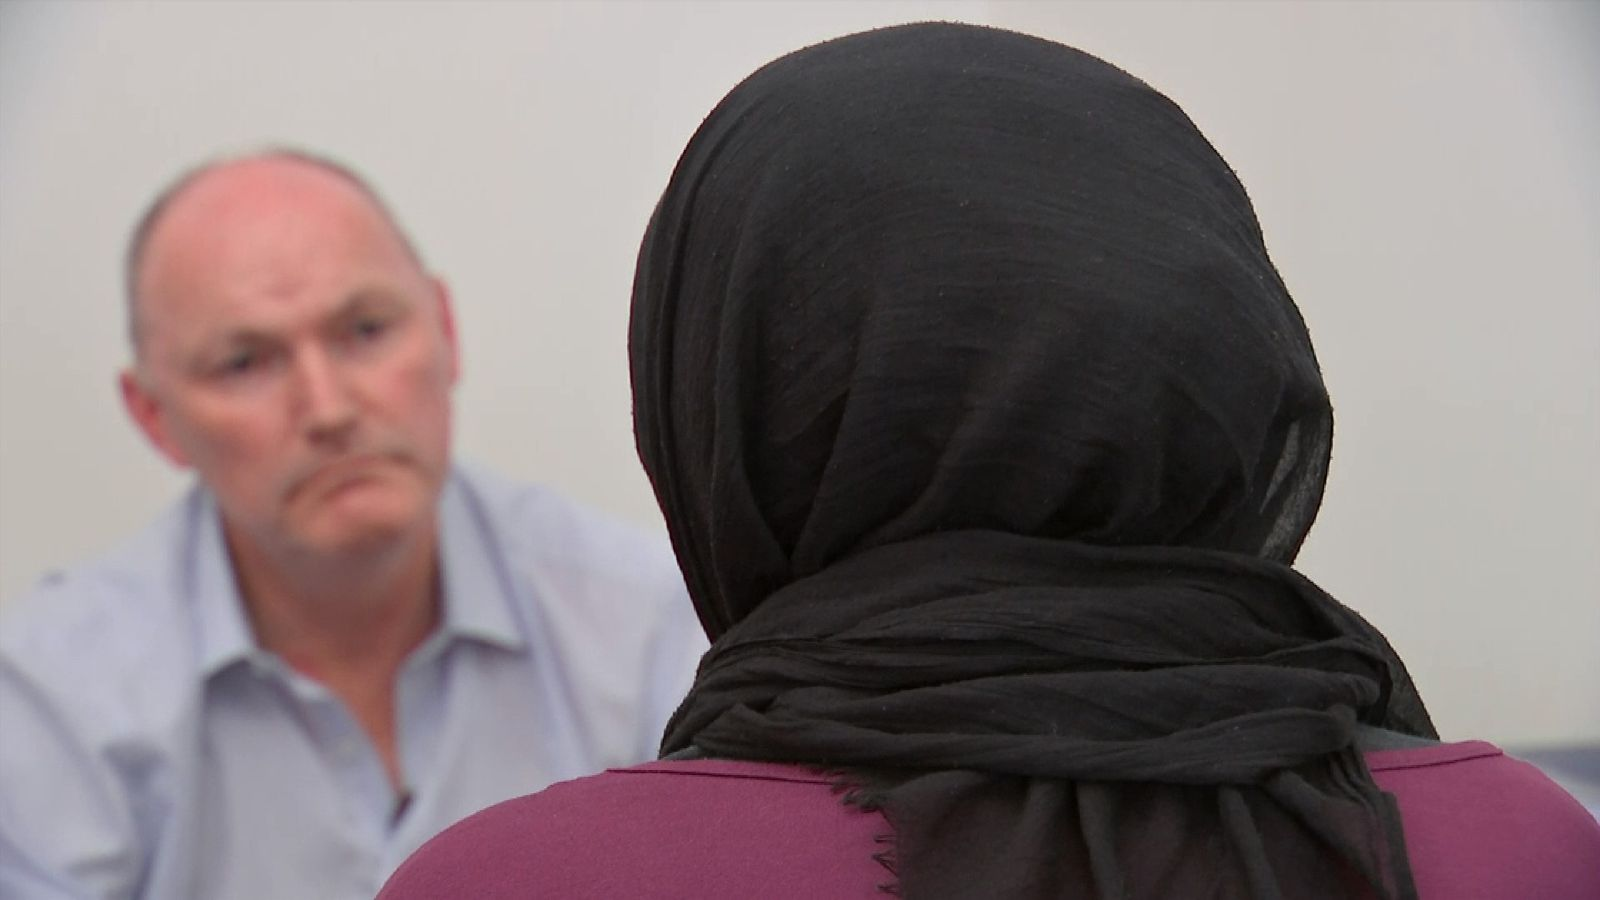 Mother of London terror attacker Youssef Zaghba speaks to Sky's Ian Woods